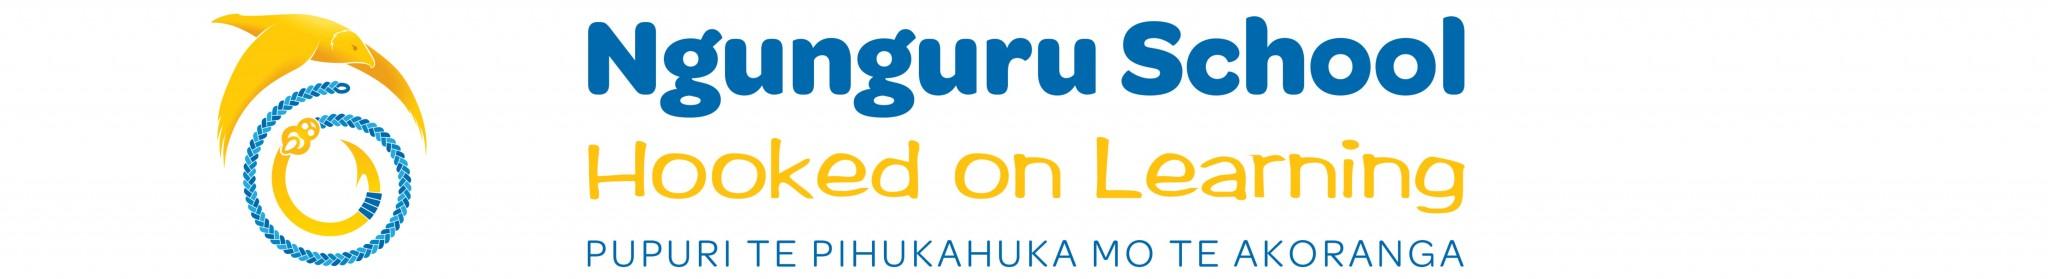 Ngunguru School Logo